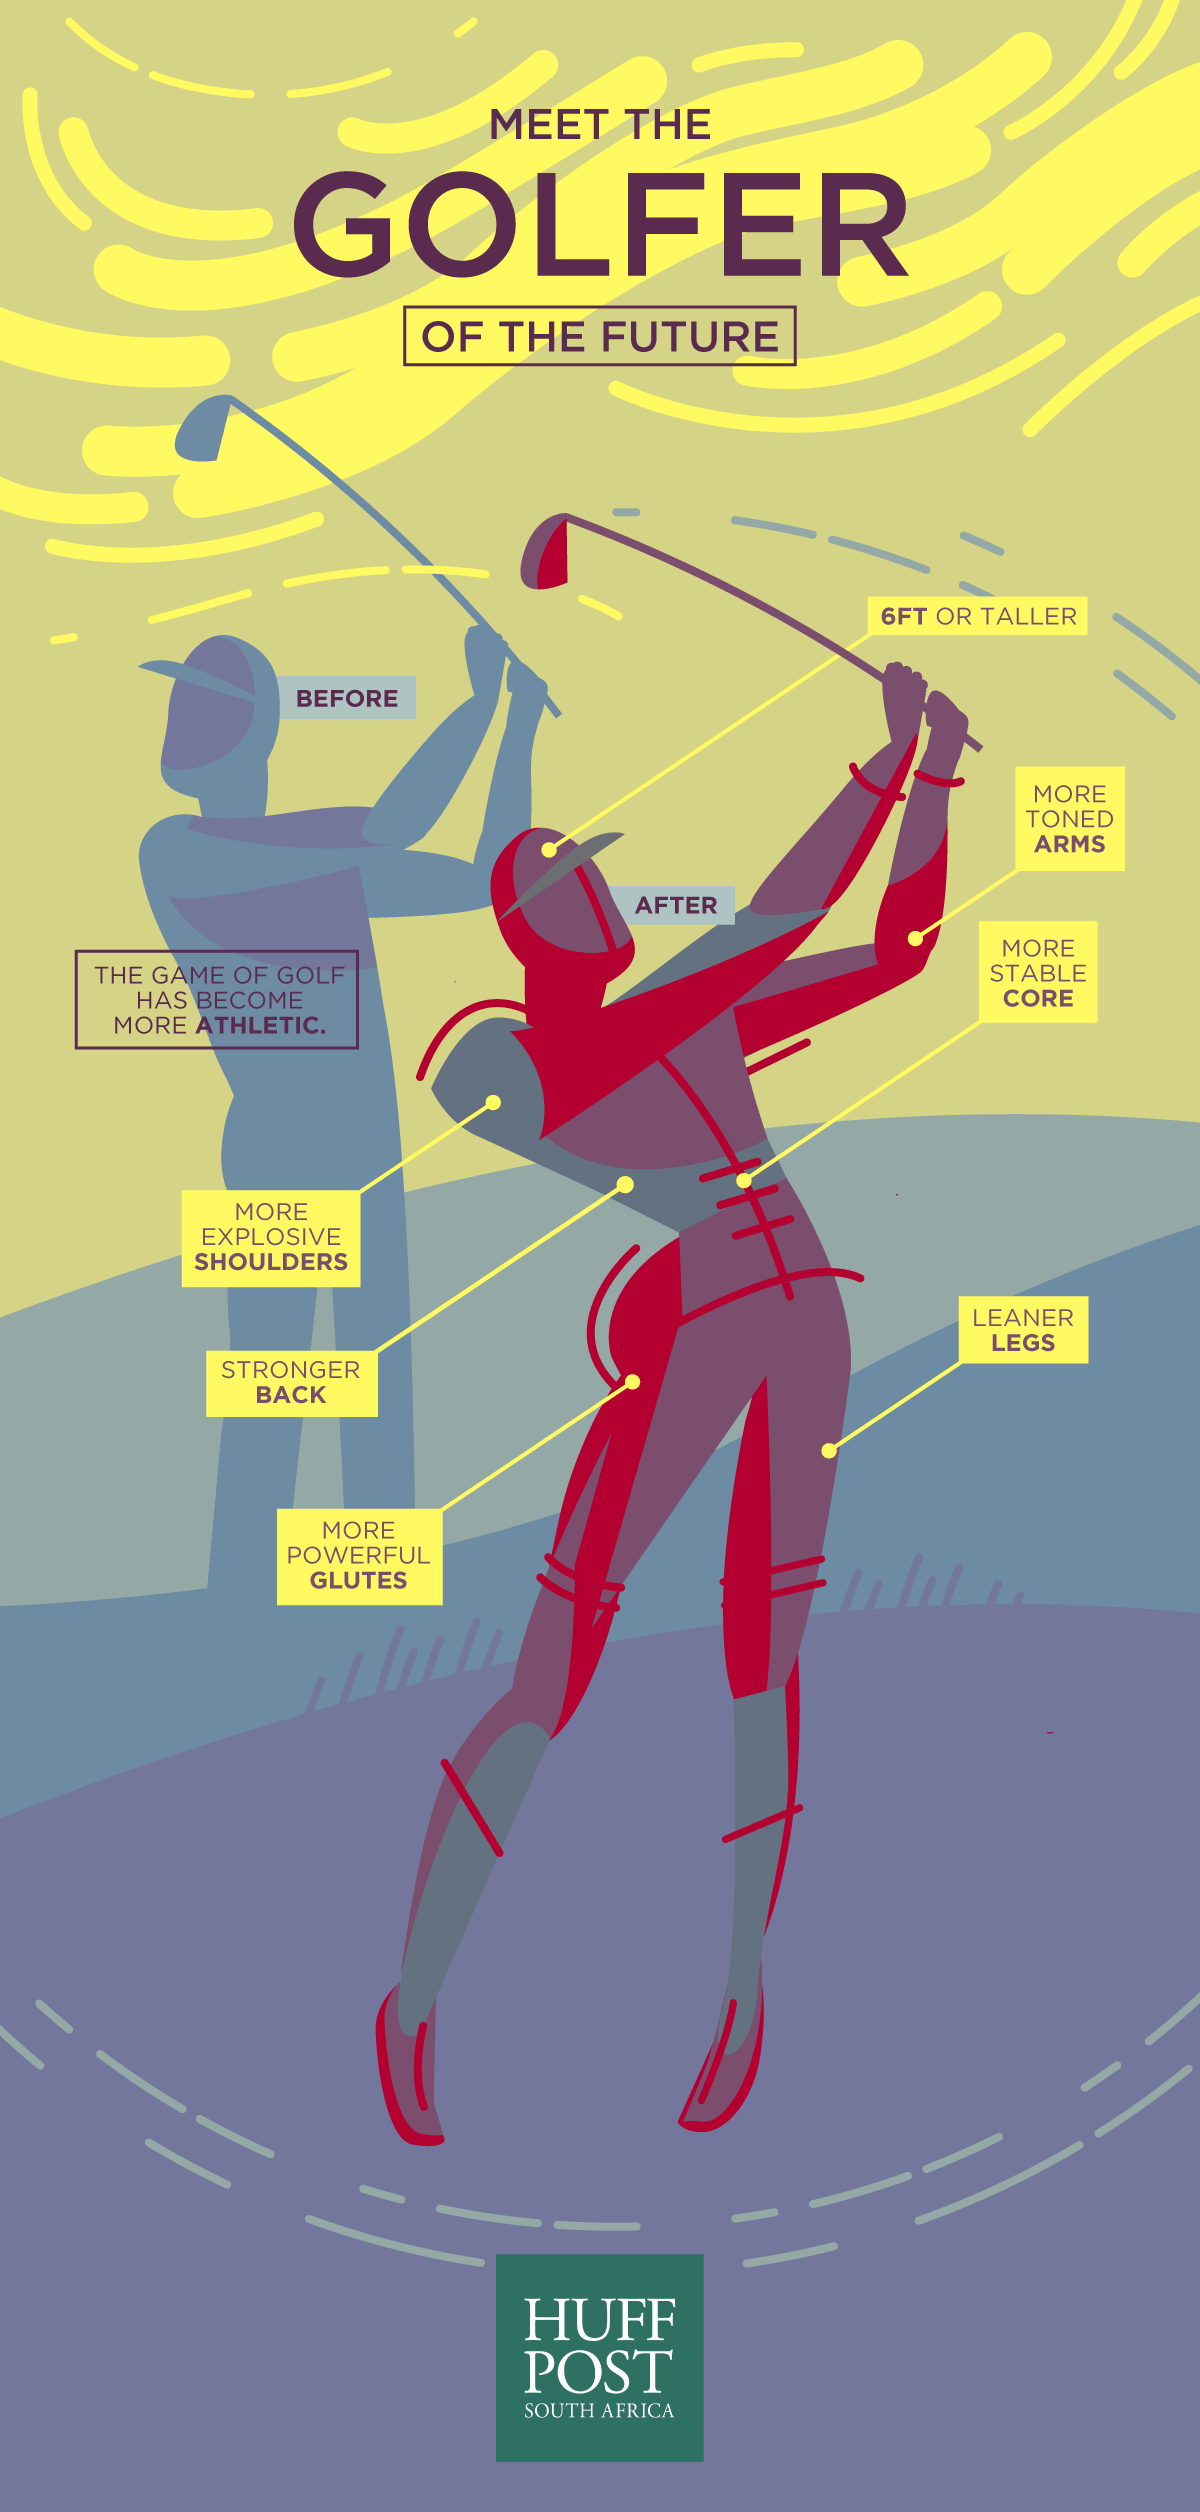 Meet The Golfer Of The